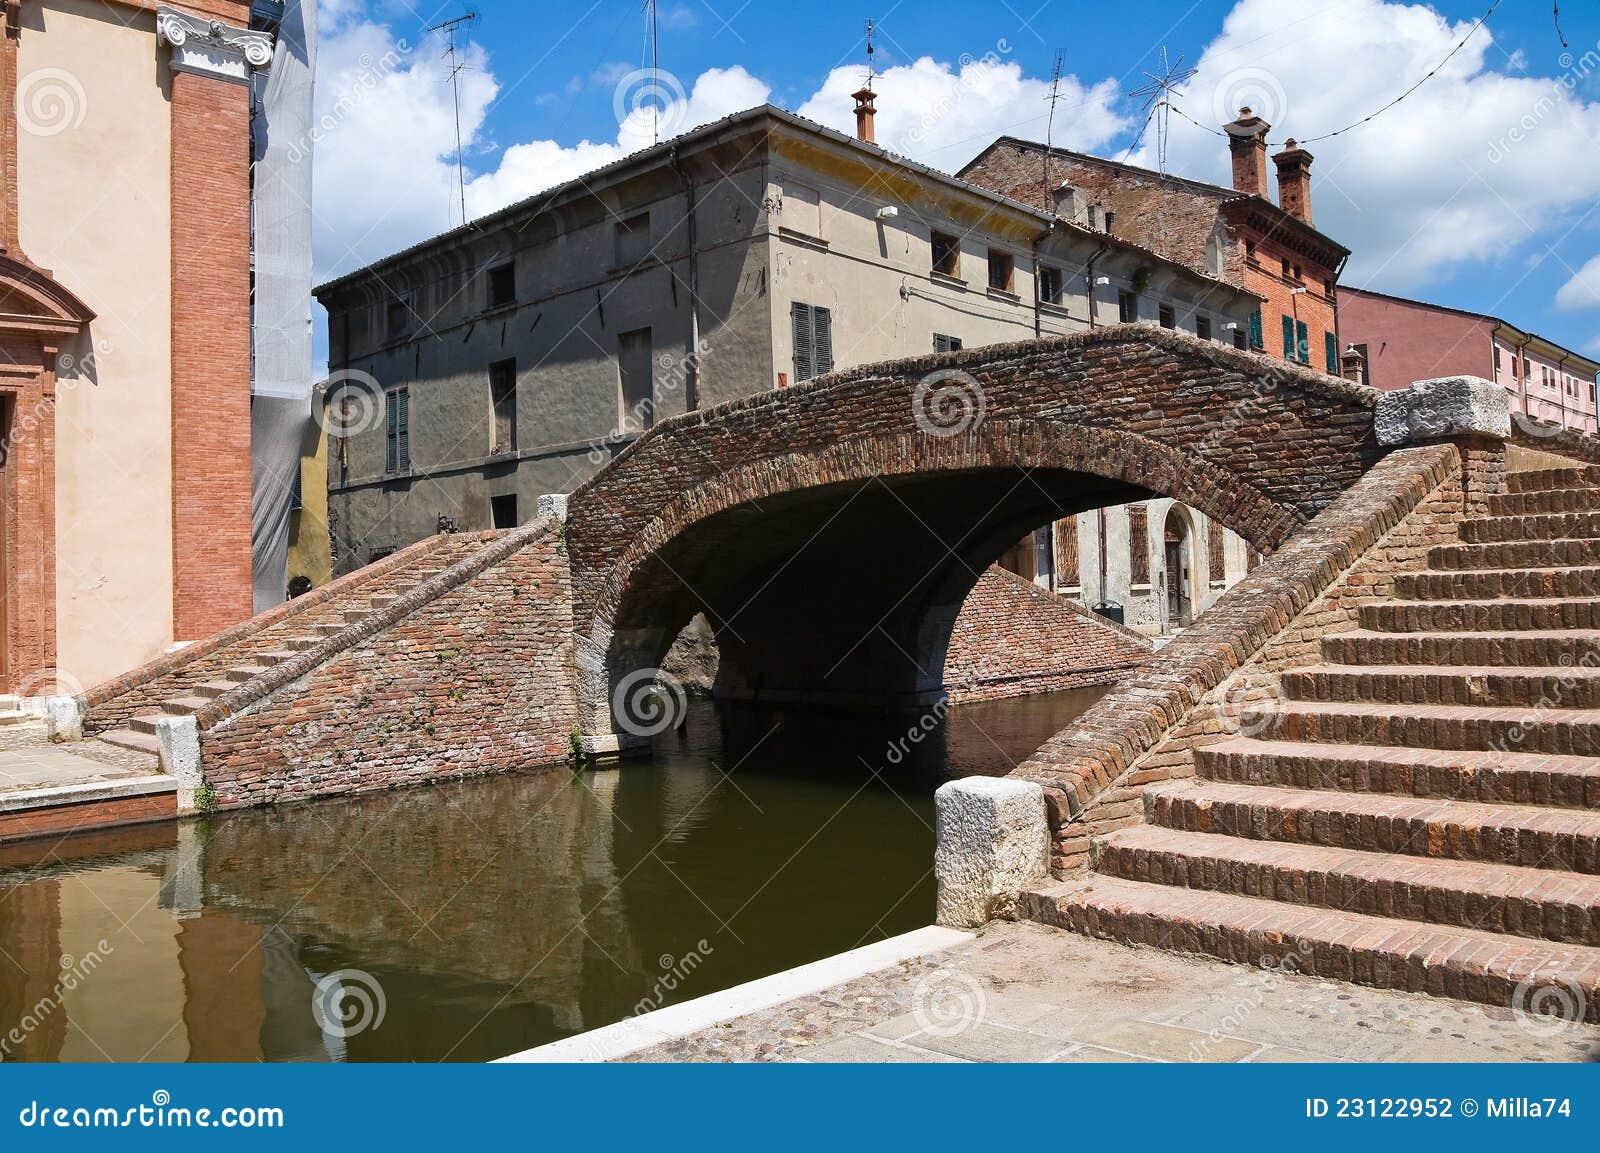 Snutar överbryggar. Comacchio. Emilia-Romagna. Italien.